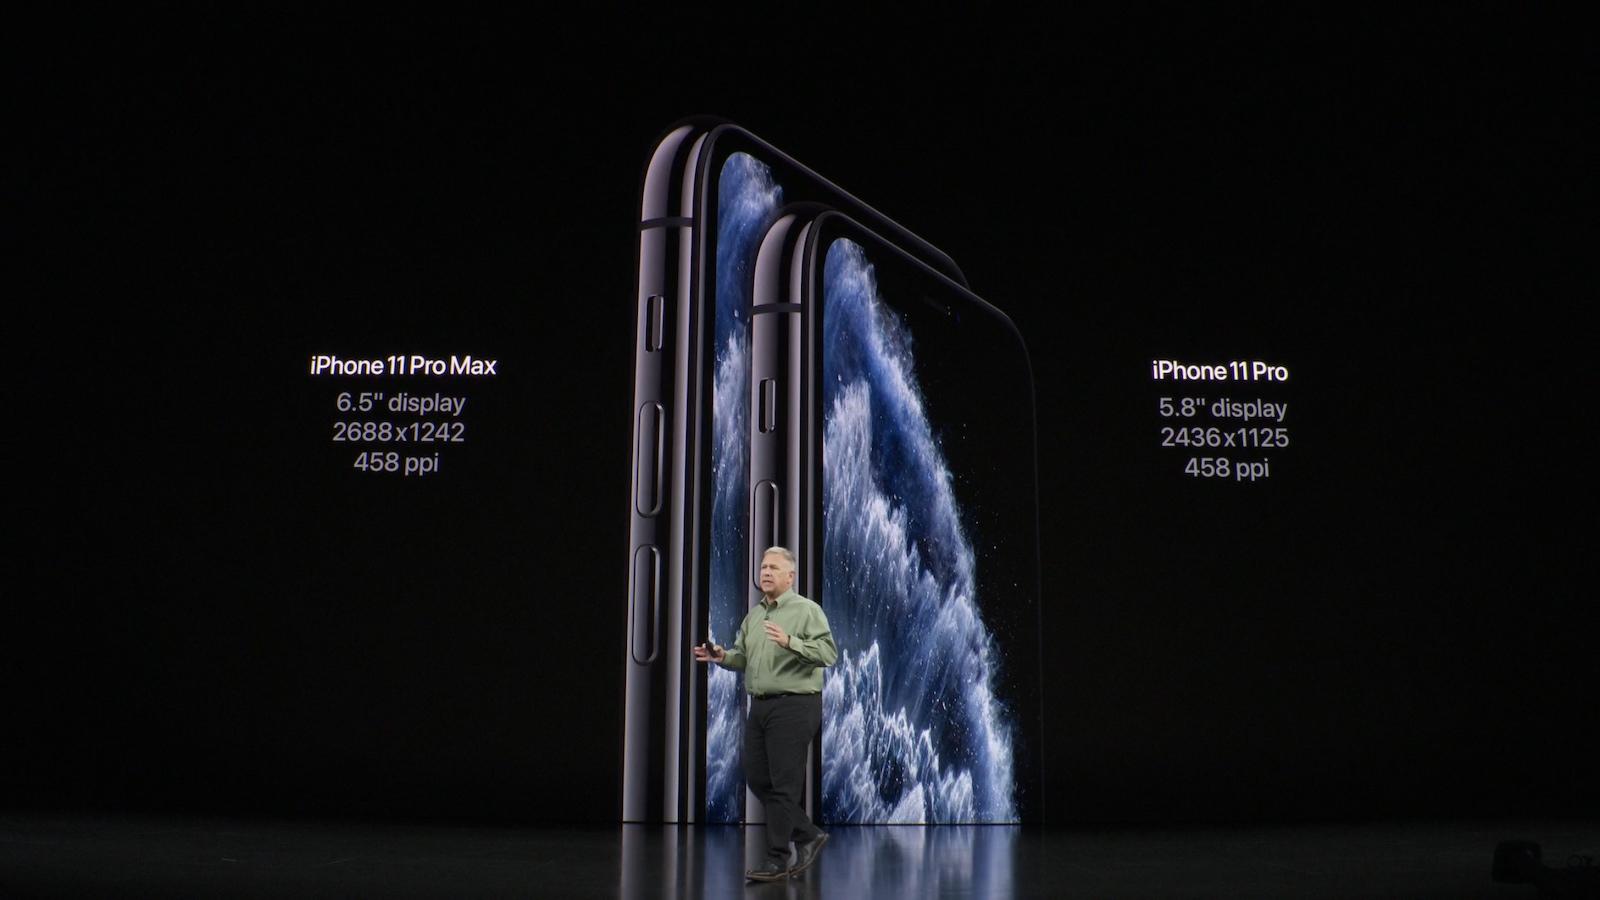 iPhone 11 Pro/Pro Maxの価格・料金を比較。最も安いキャリアは?